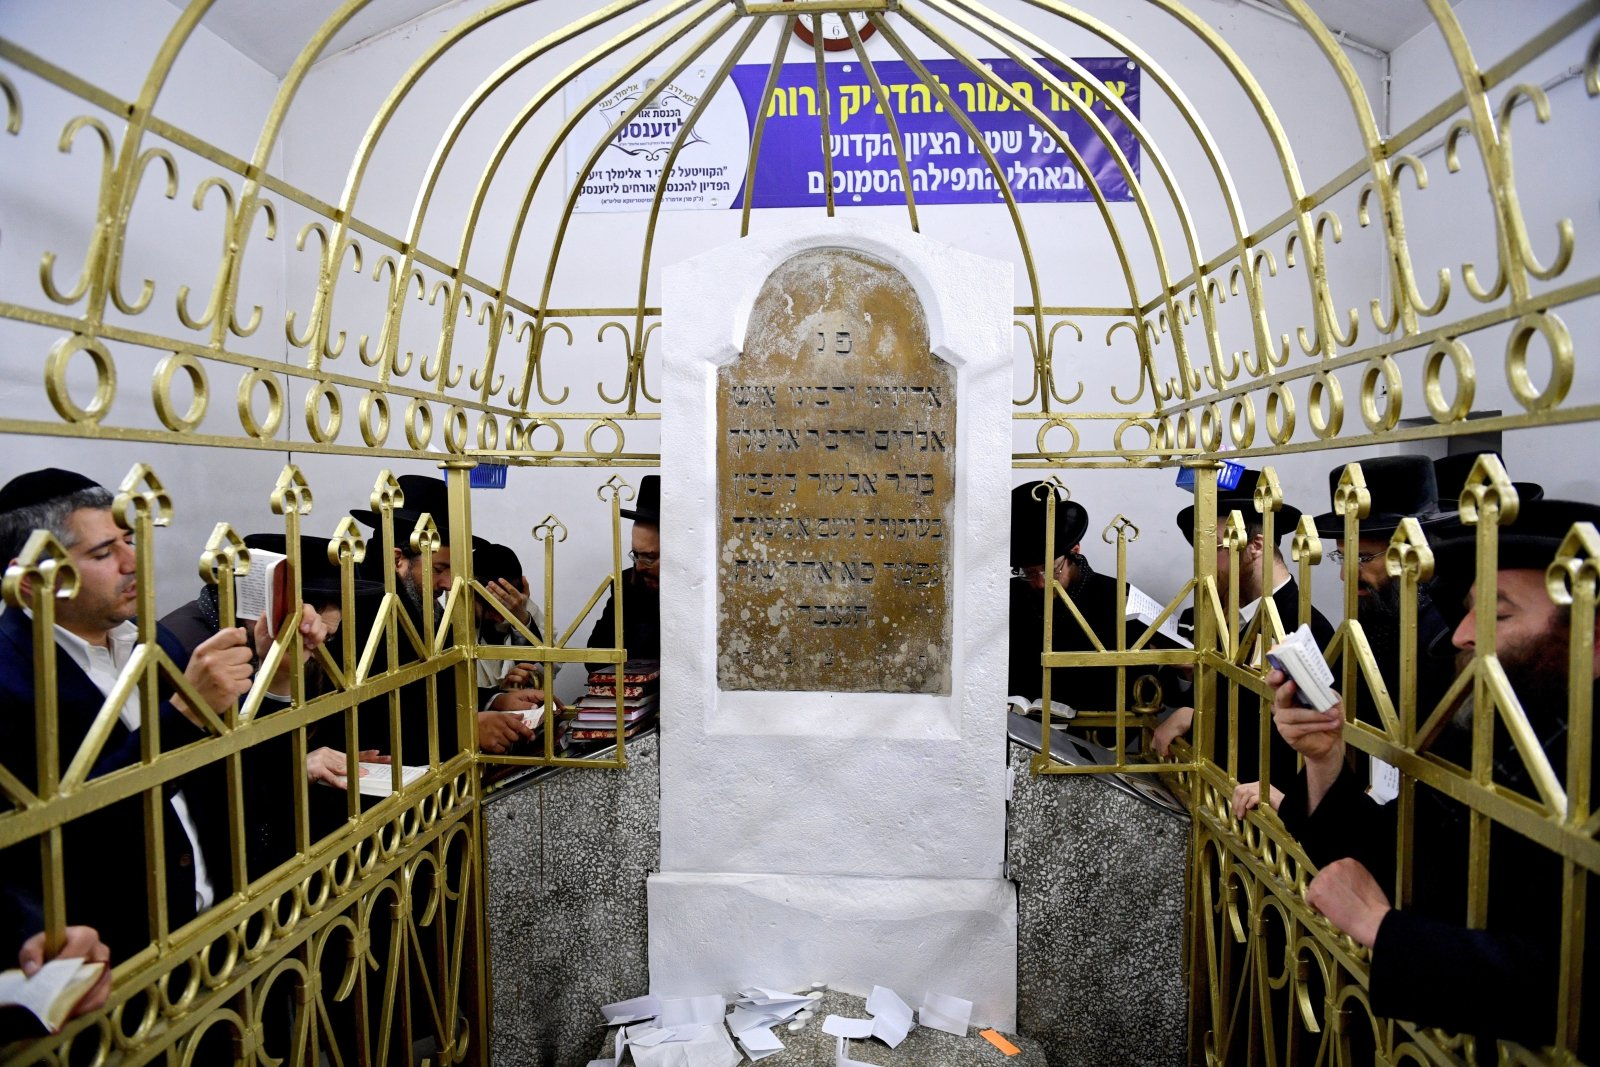 chasydzi żydzi jews